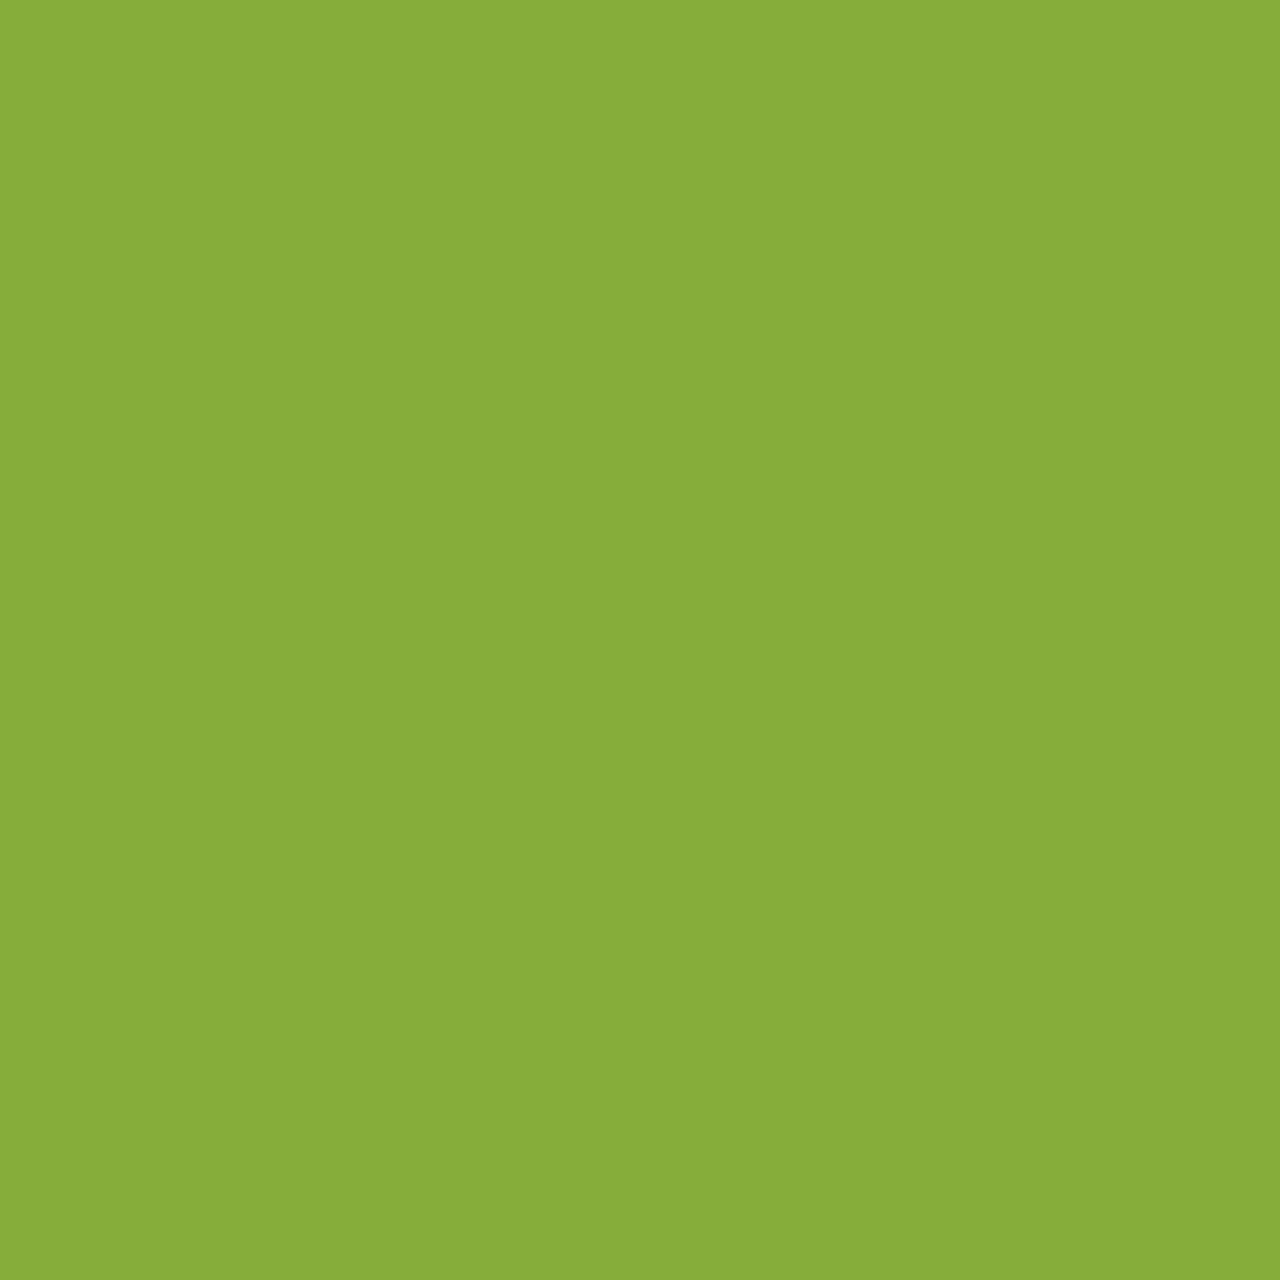 "#0086 Rosco Gels Roscolux Pea Green, 20x24"""